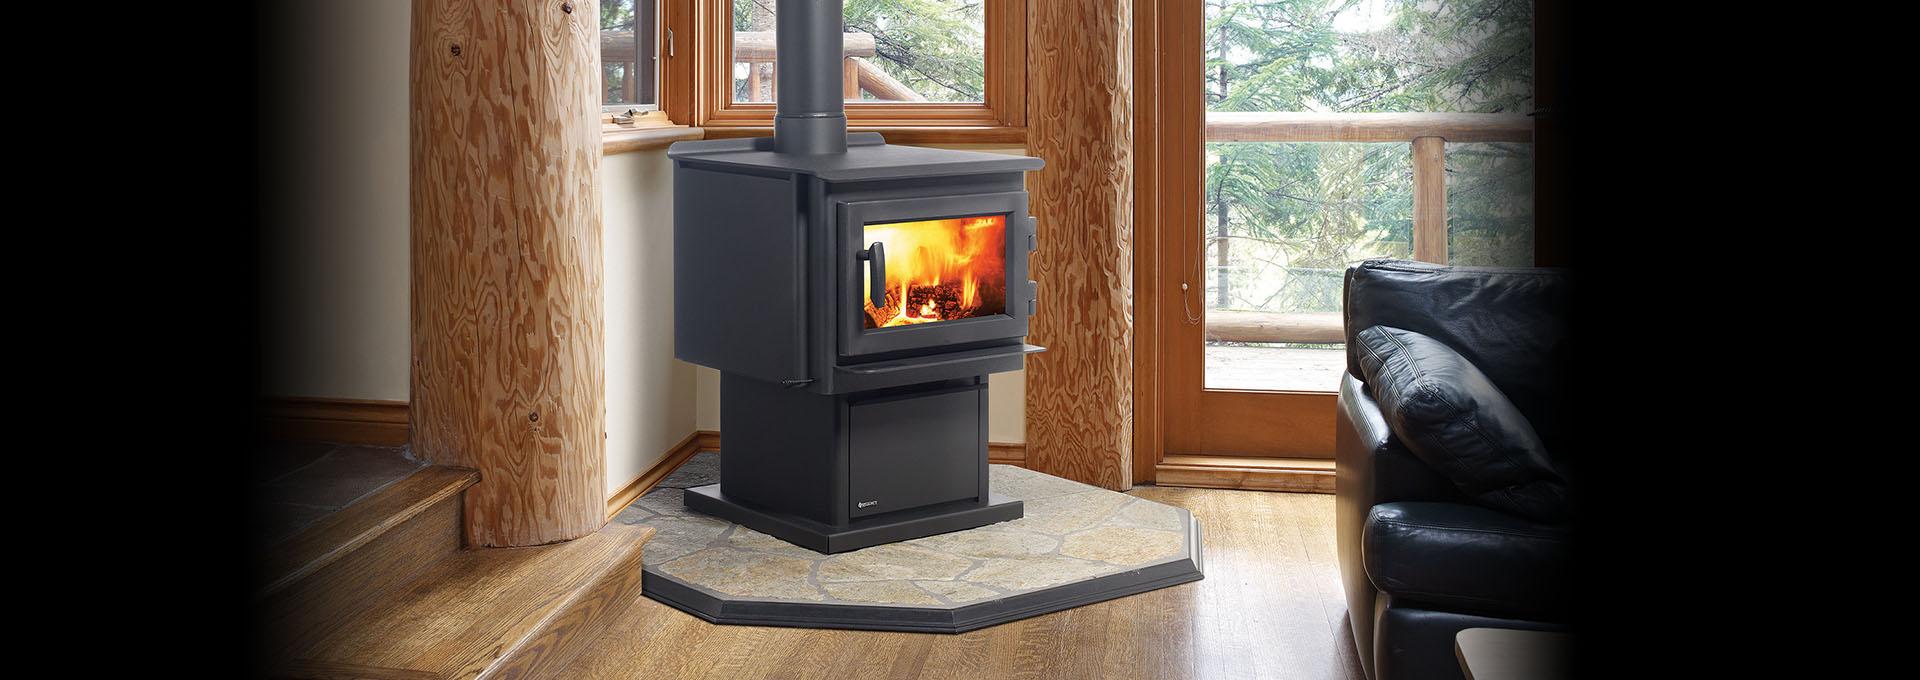 f2400 medium wood stove regency fireplace products rh regency fire com Regency Stoves Regency Stoves Any Good